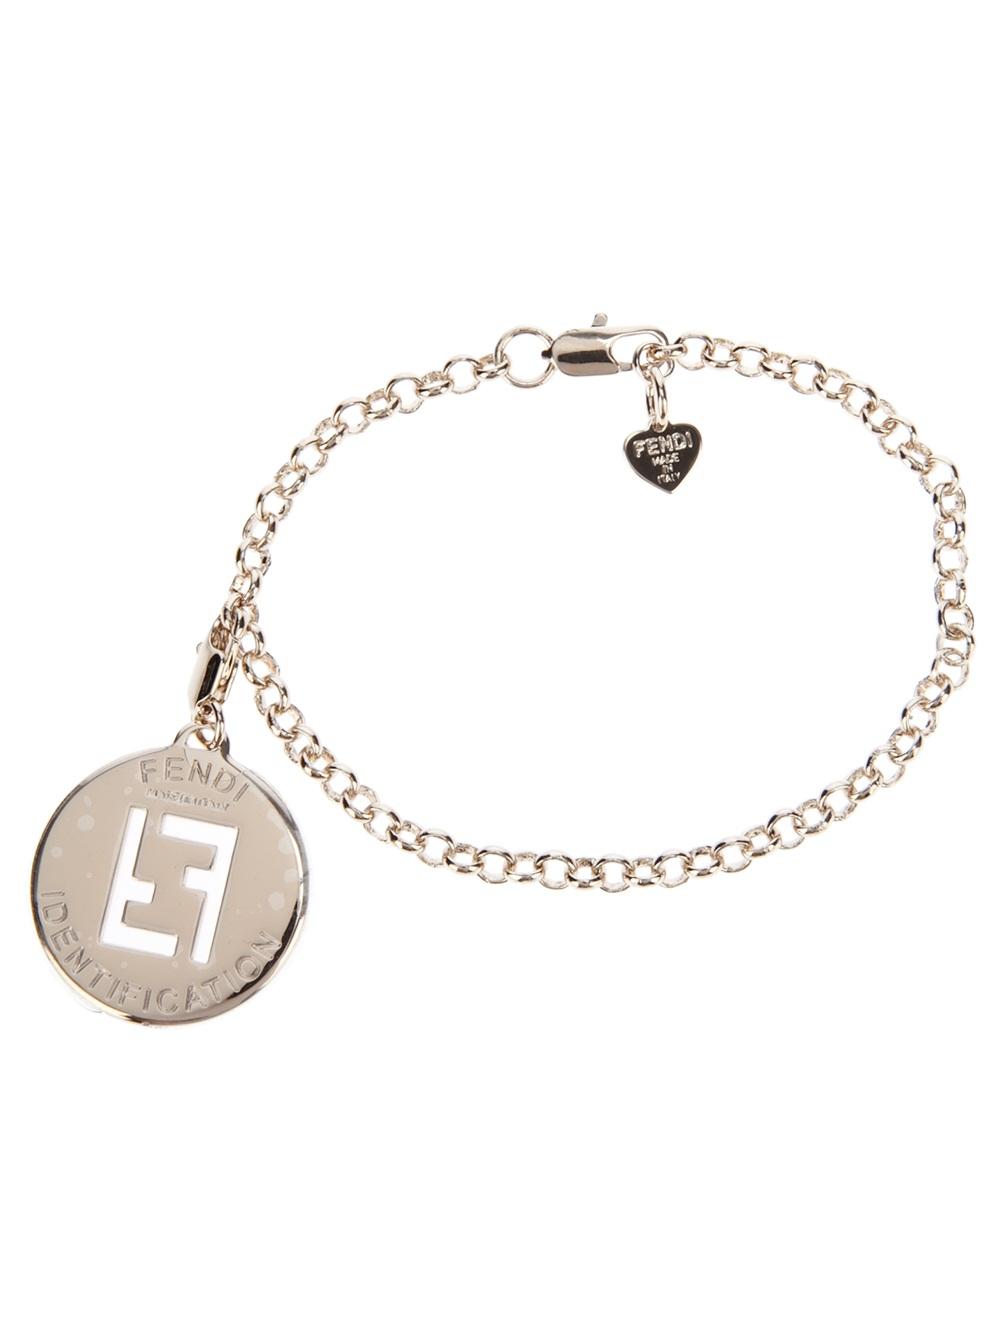 charm bracelet - Metallic Fendi 4Ew6kP4hCU